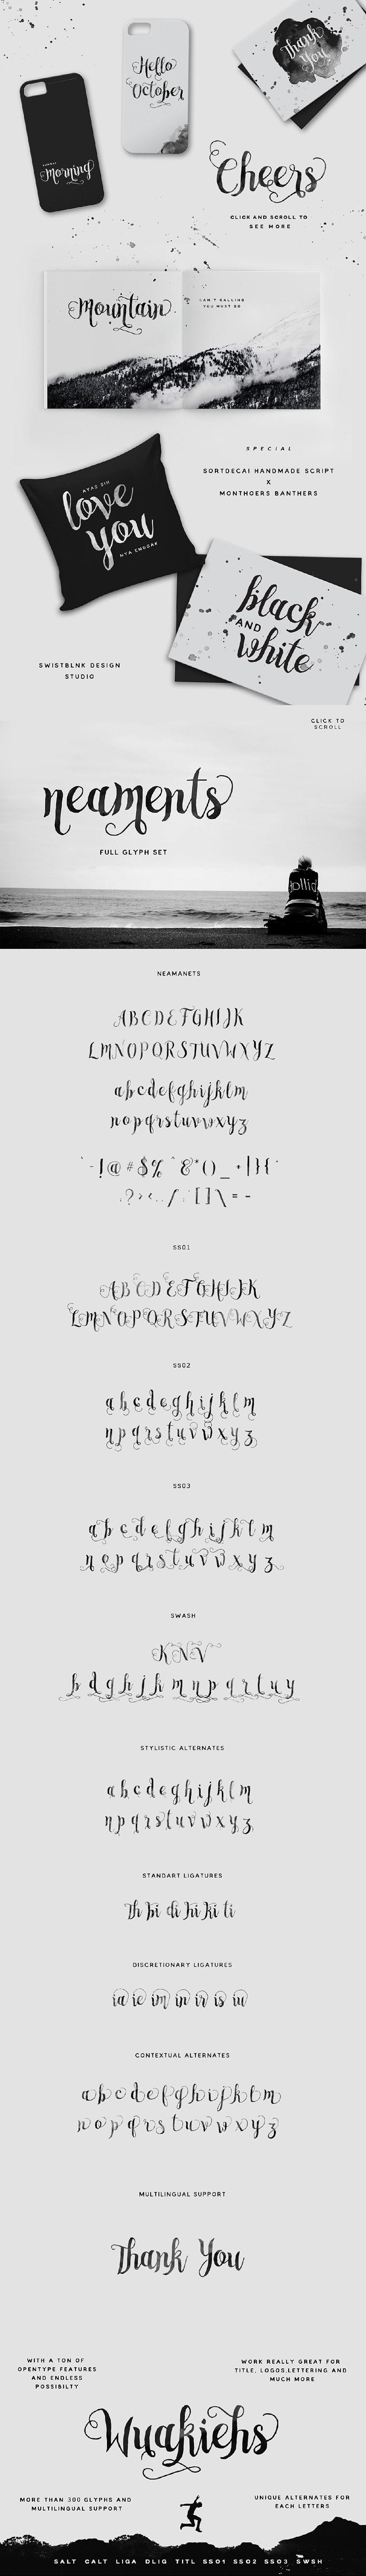 Neaments Typeface